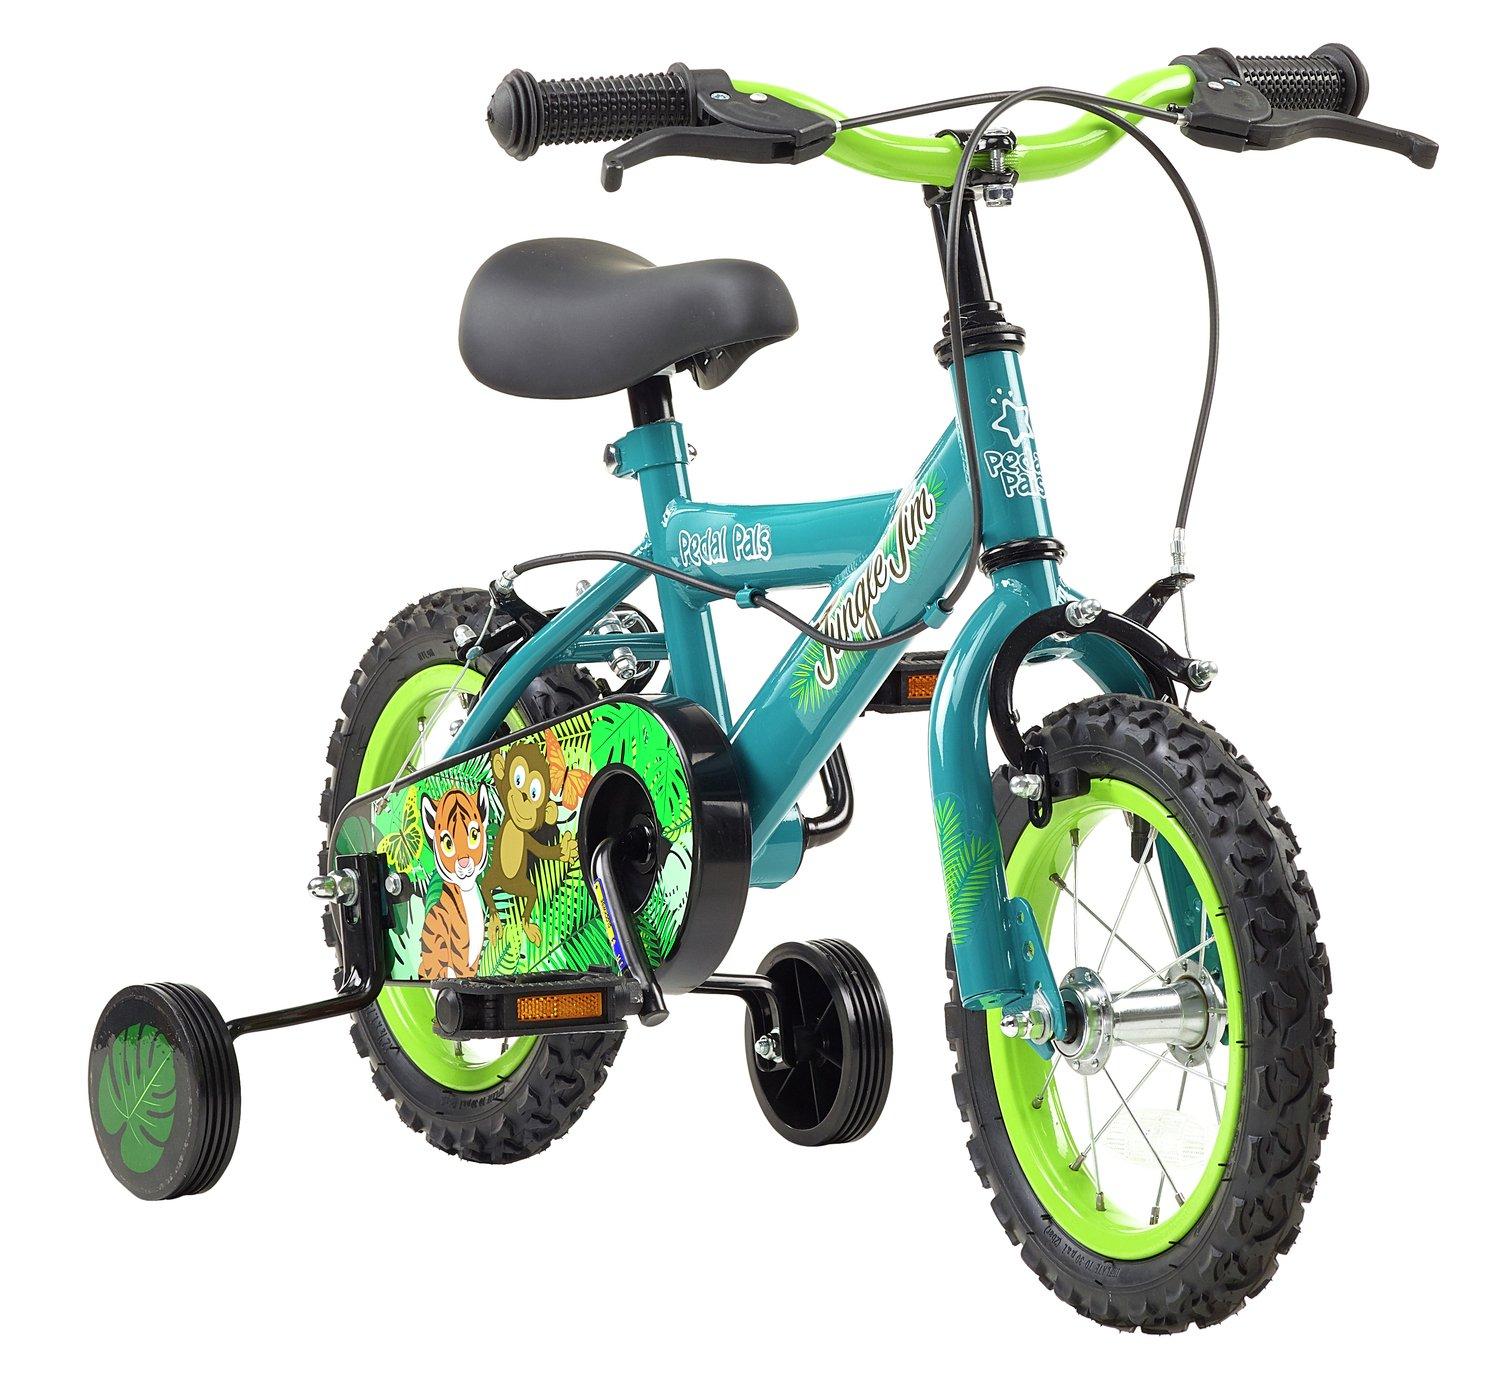 Pedal Pals 12 Inch Jungle Kids Bike Review